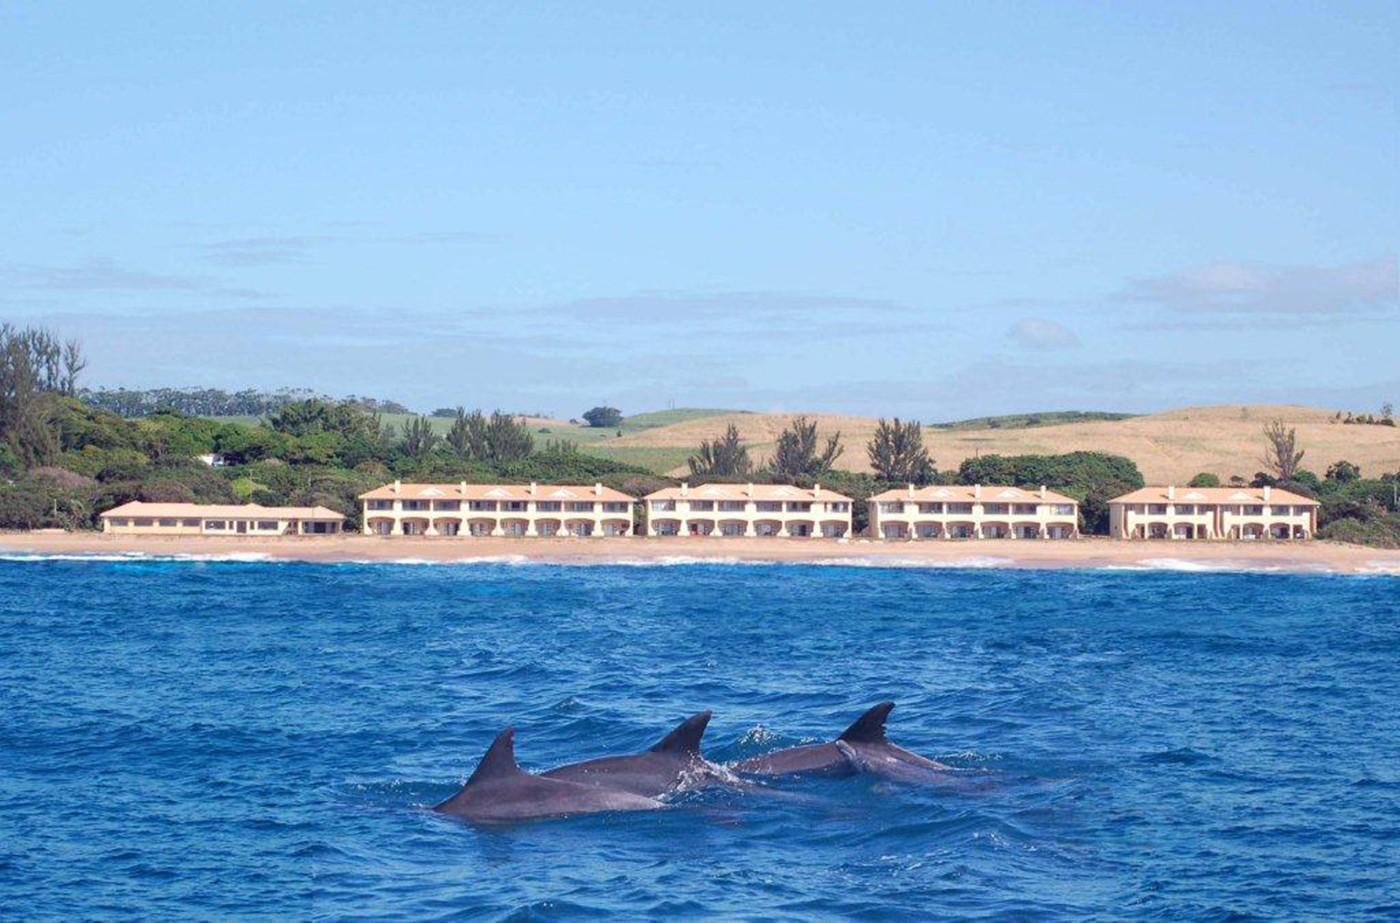 The Happy Wanderers Holiday Resort